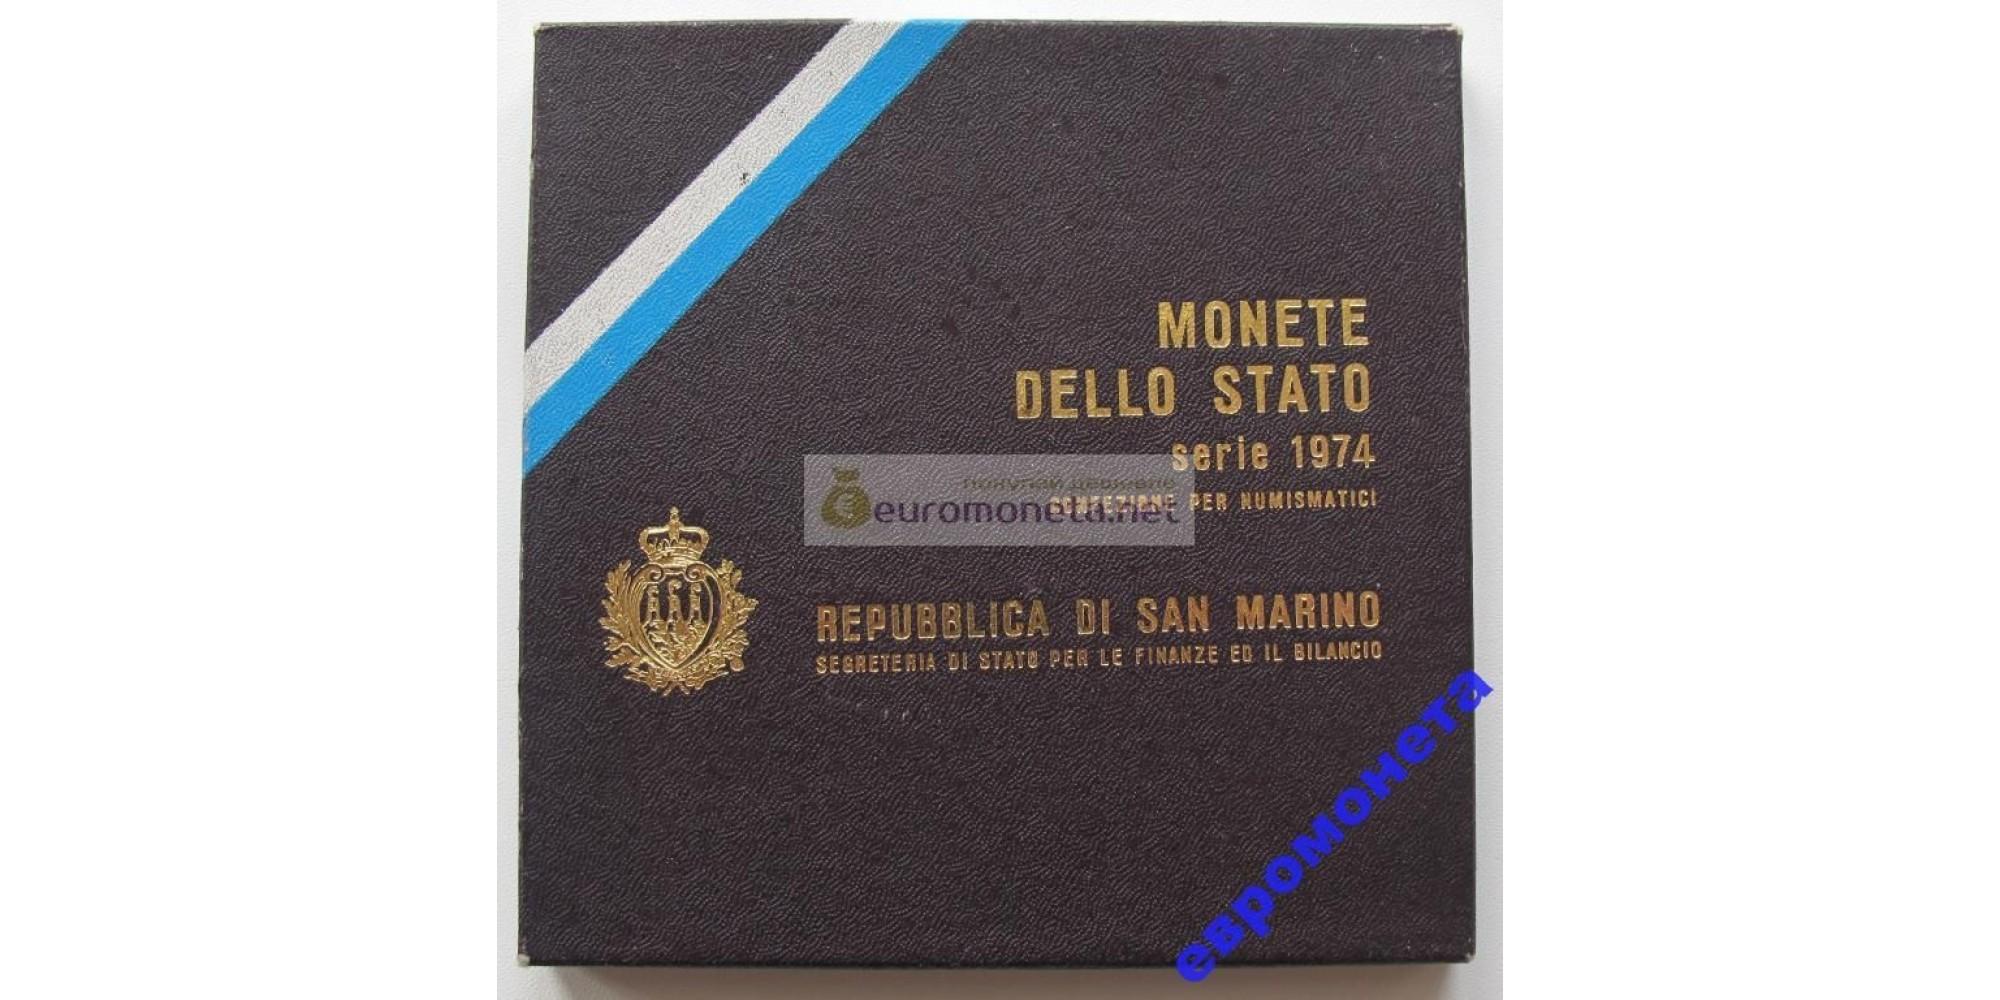 Сан-Марино набор монет 1974 год 8 монет включая 500 лир серебро UNC